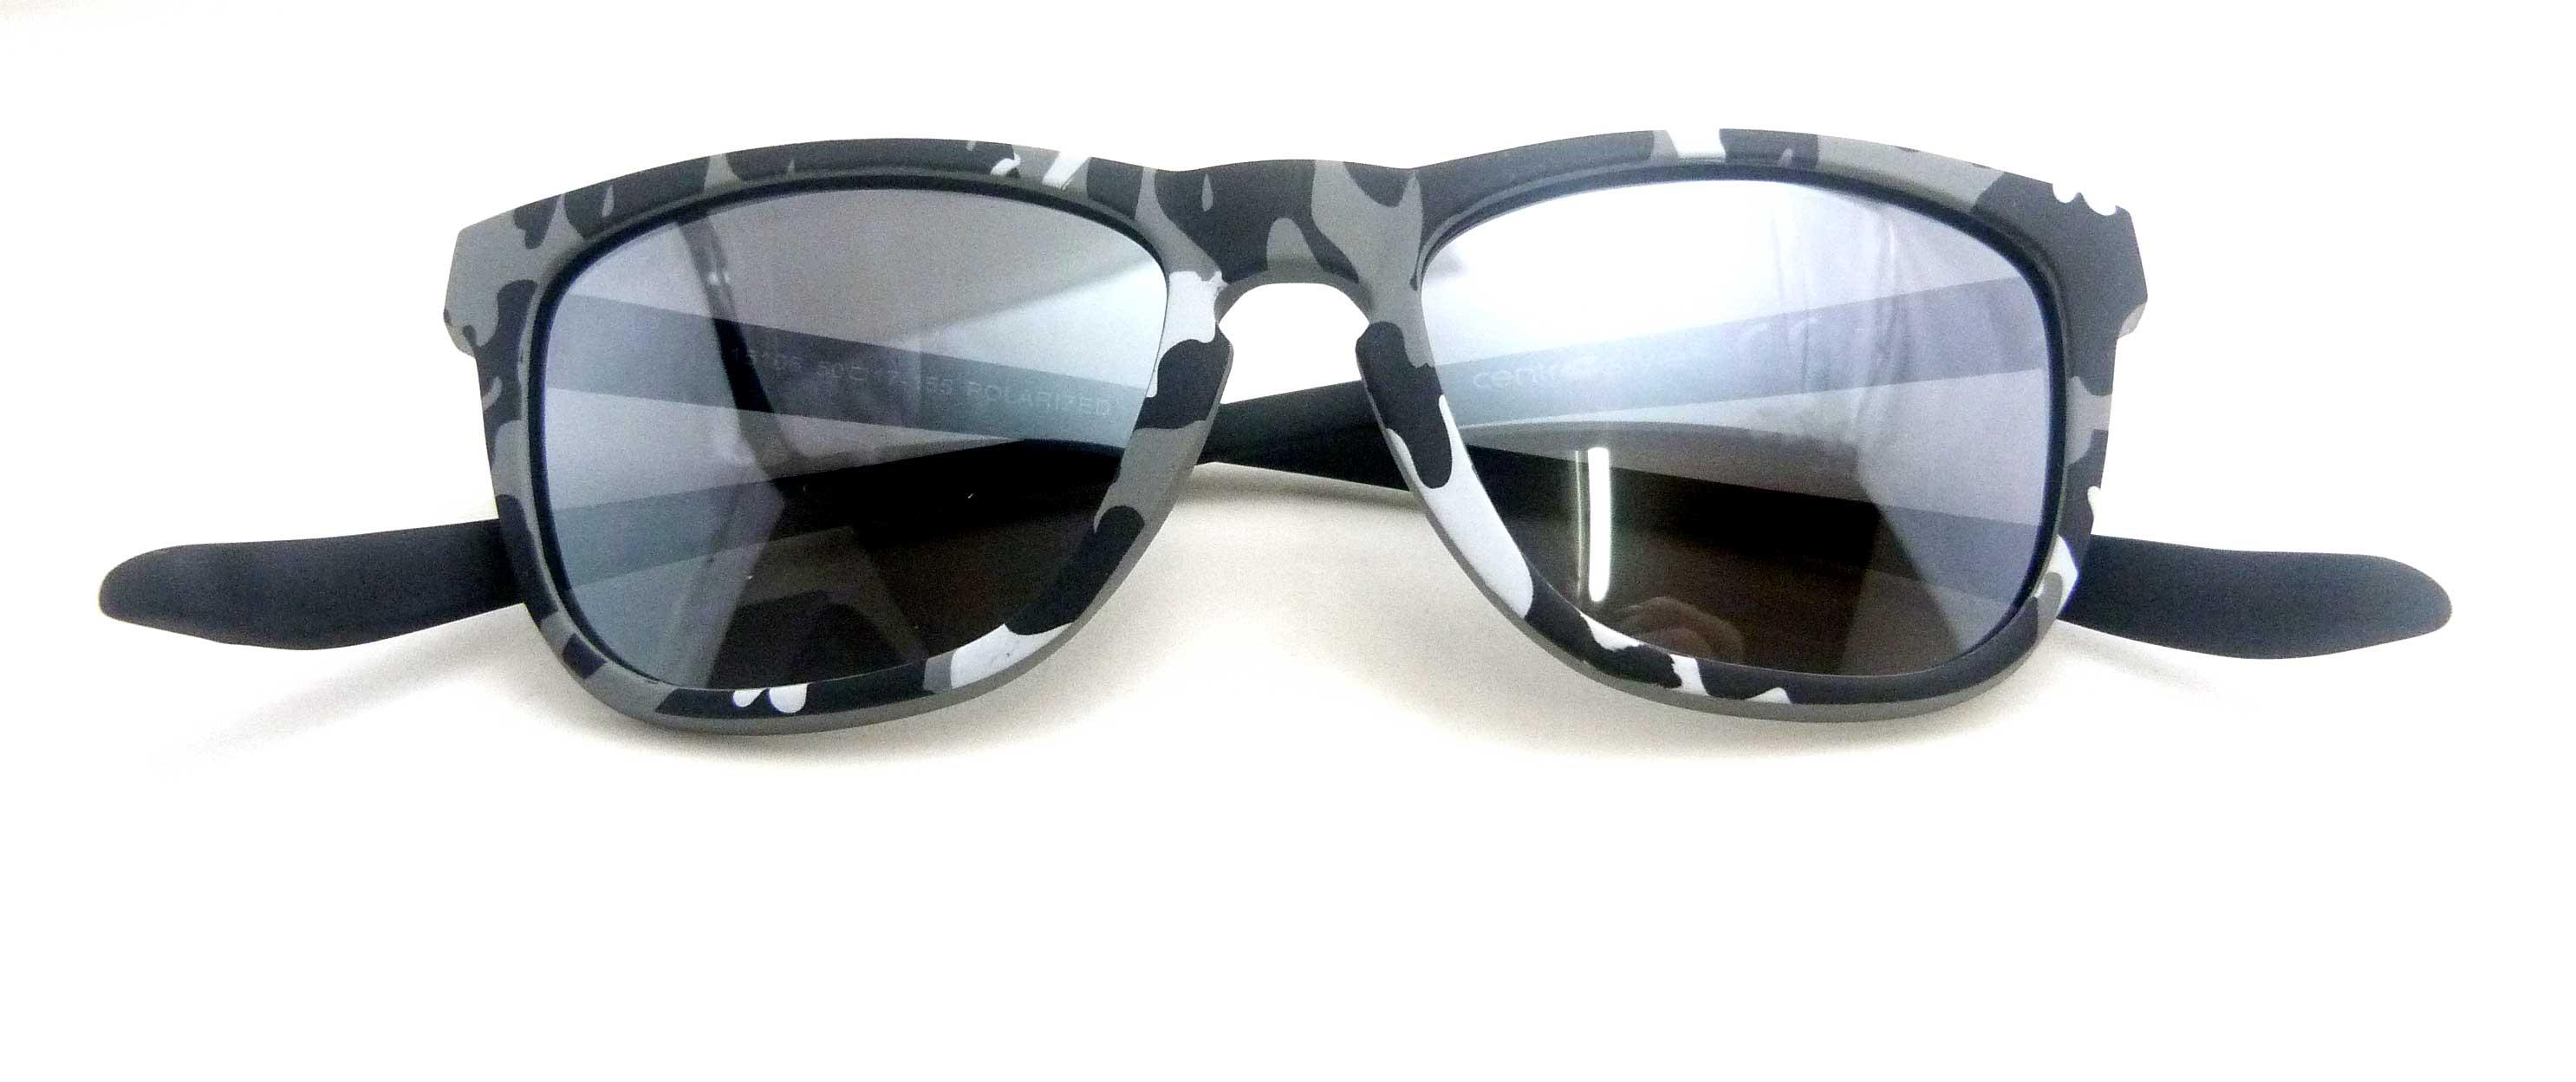 0215106 - Óculos-Solar CS Koala Camuflado 50x17 Cinza Mod 15106 FLAG 9 - Contém 1 Peça